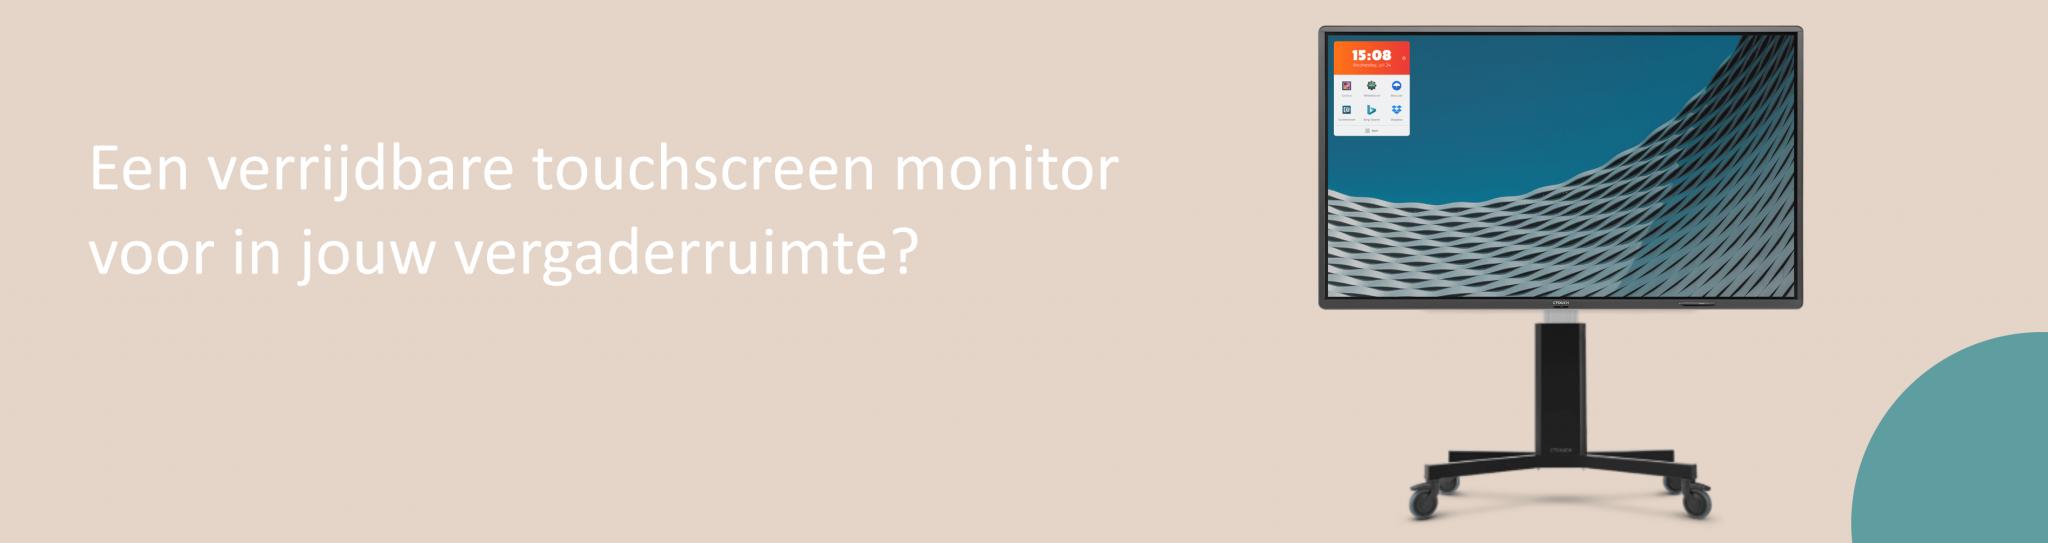 Touchscreen monitor kopen